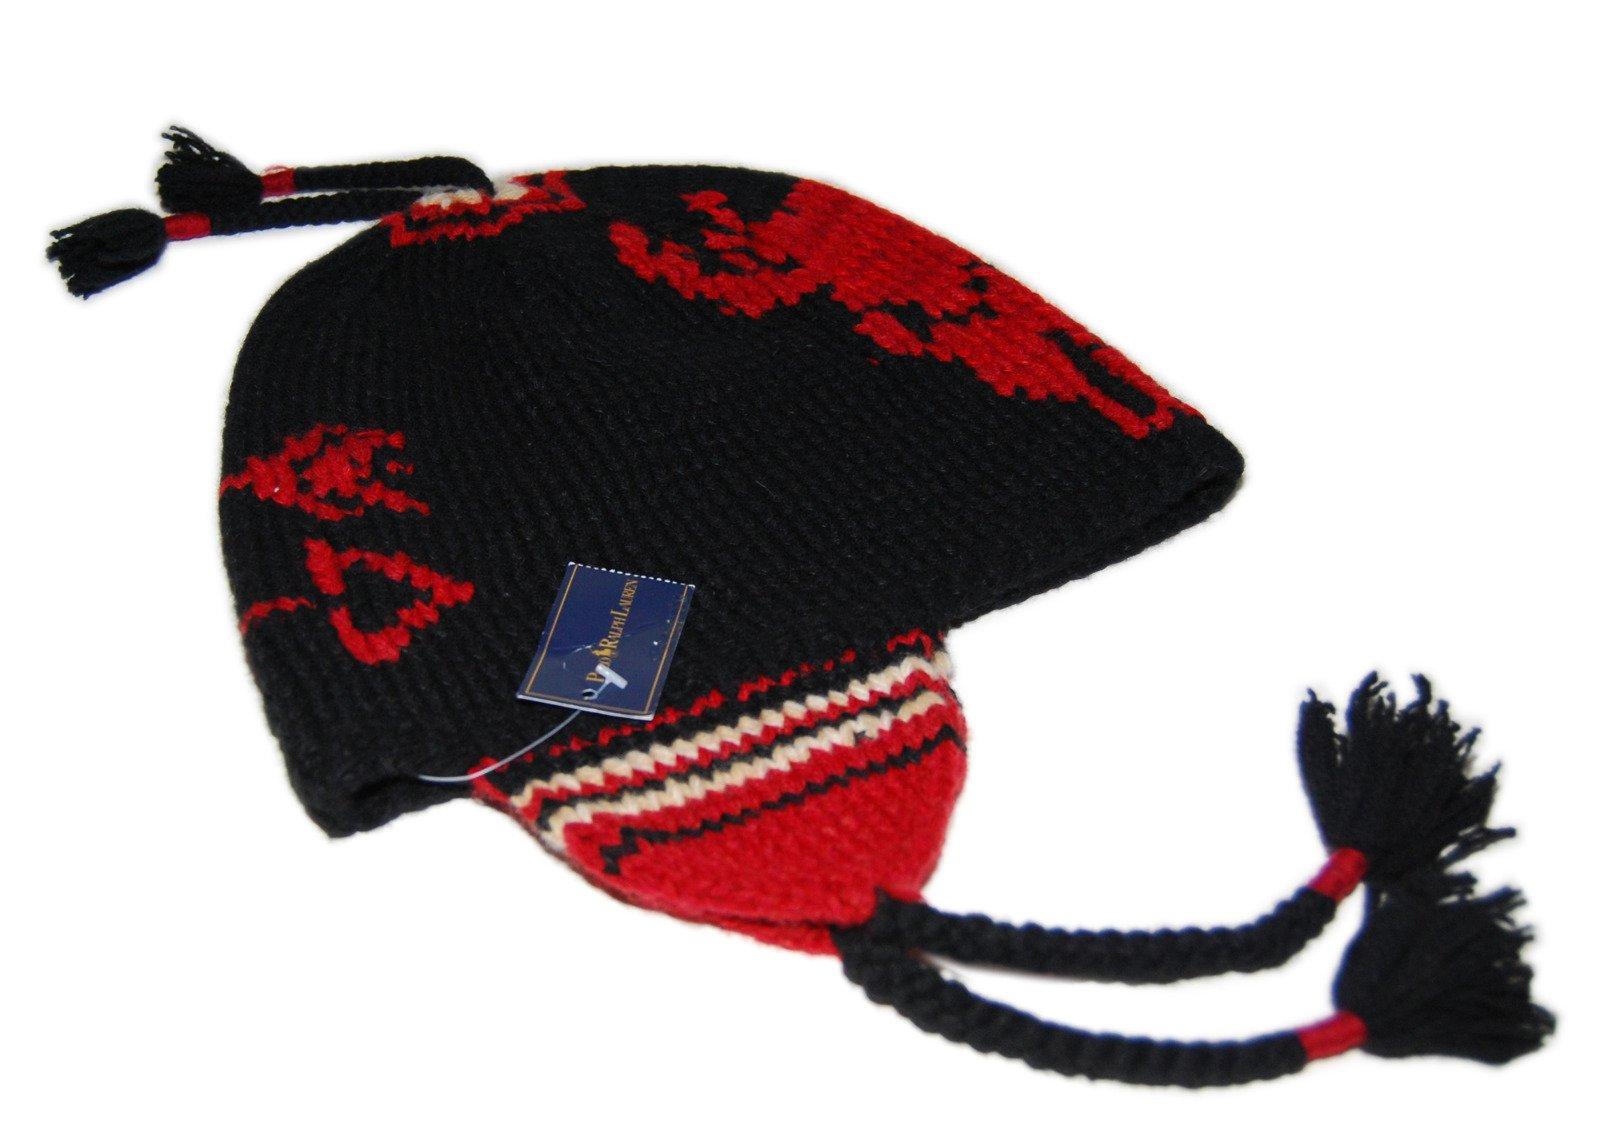 Polo Ralph Lauren Mens Western Indian Linen Wool Skull Knit Hat Cap Black Red by RALPH LAUREN